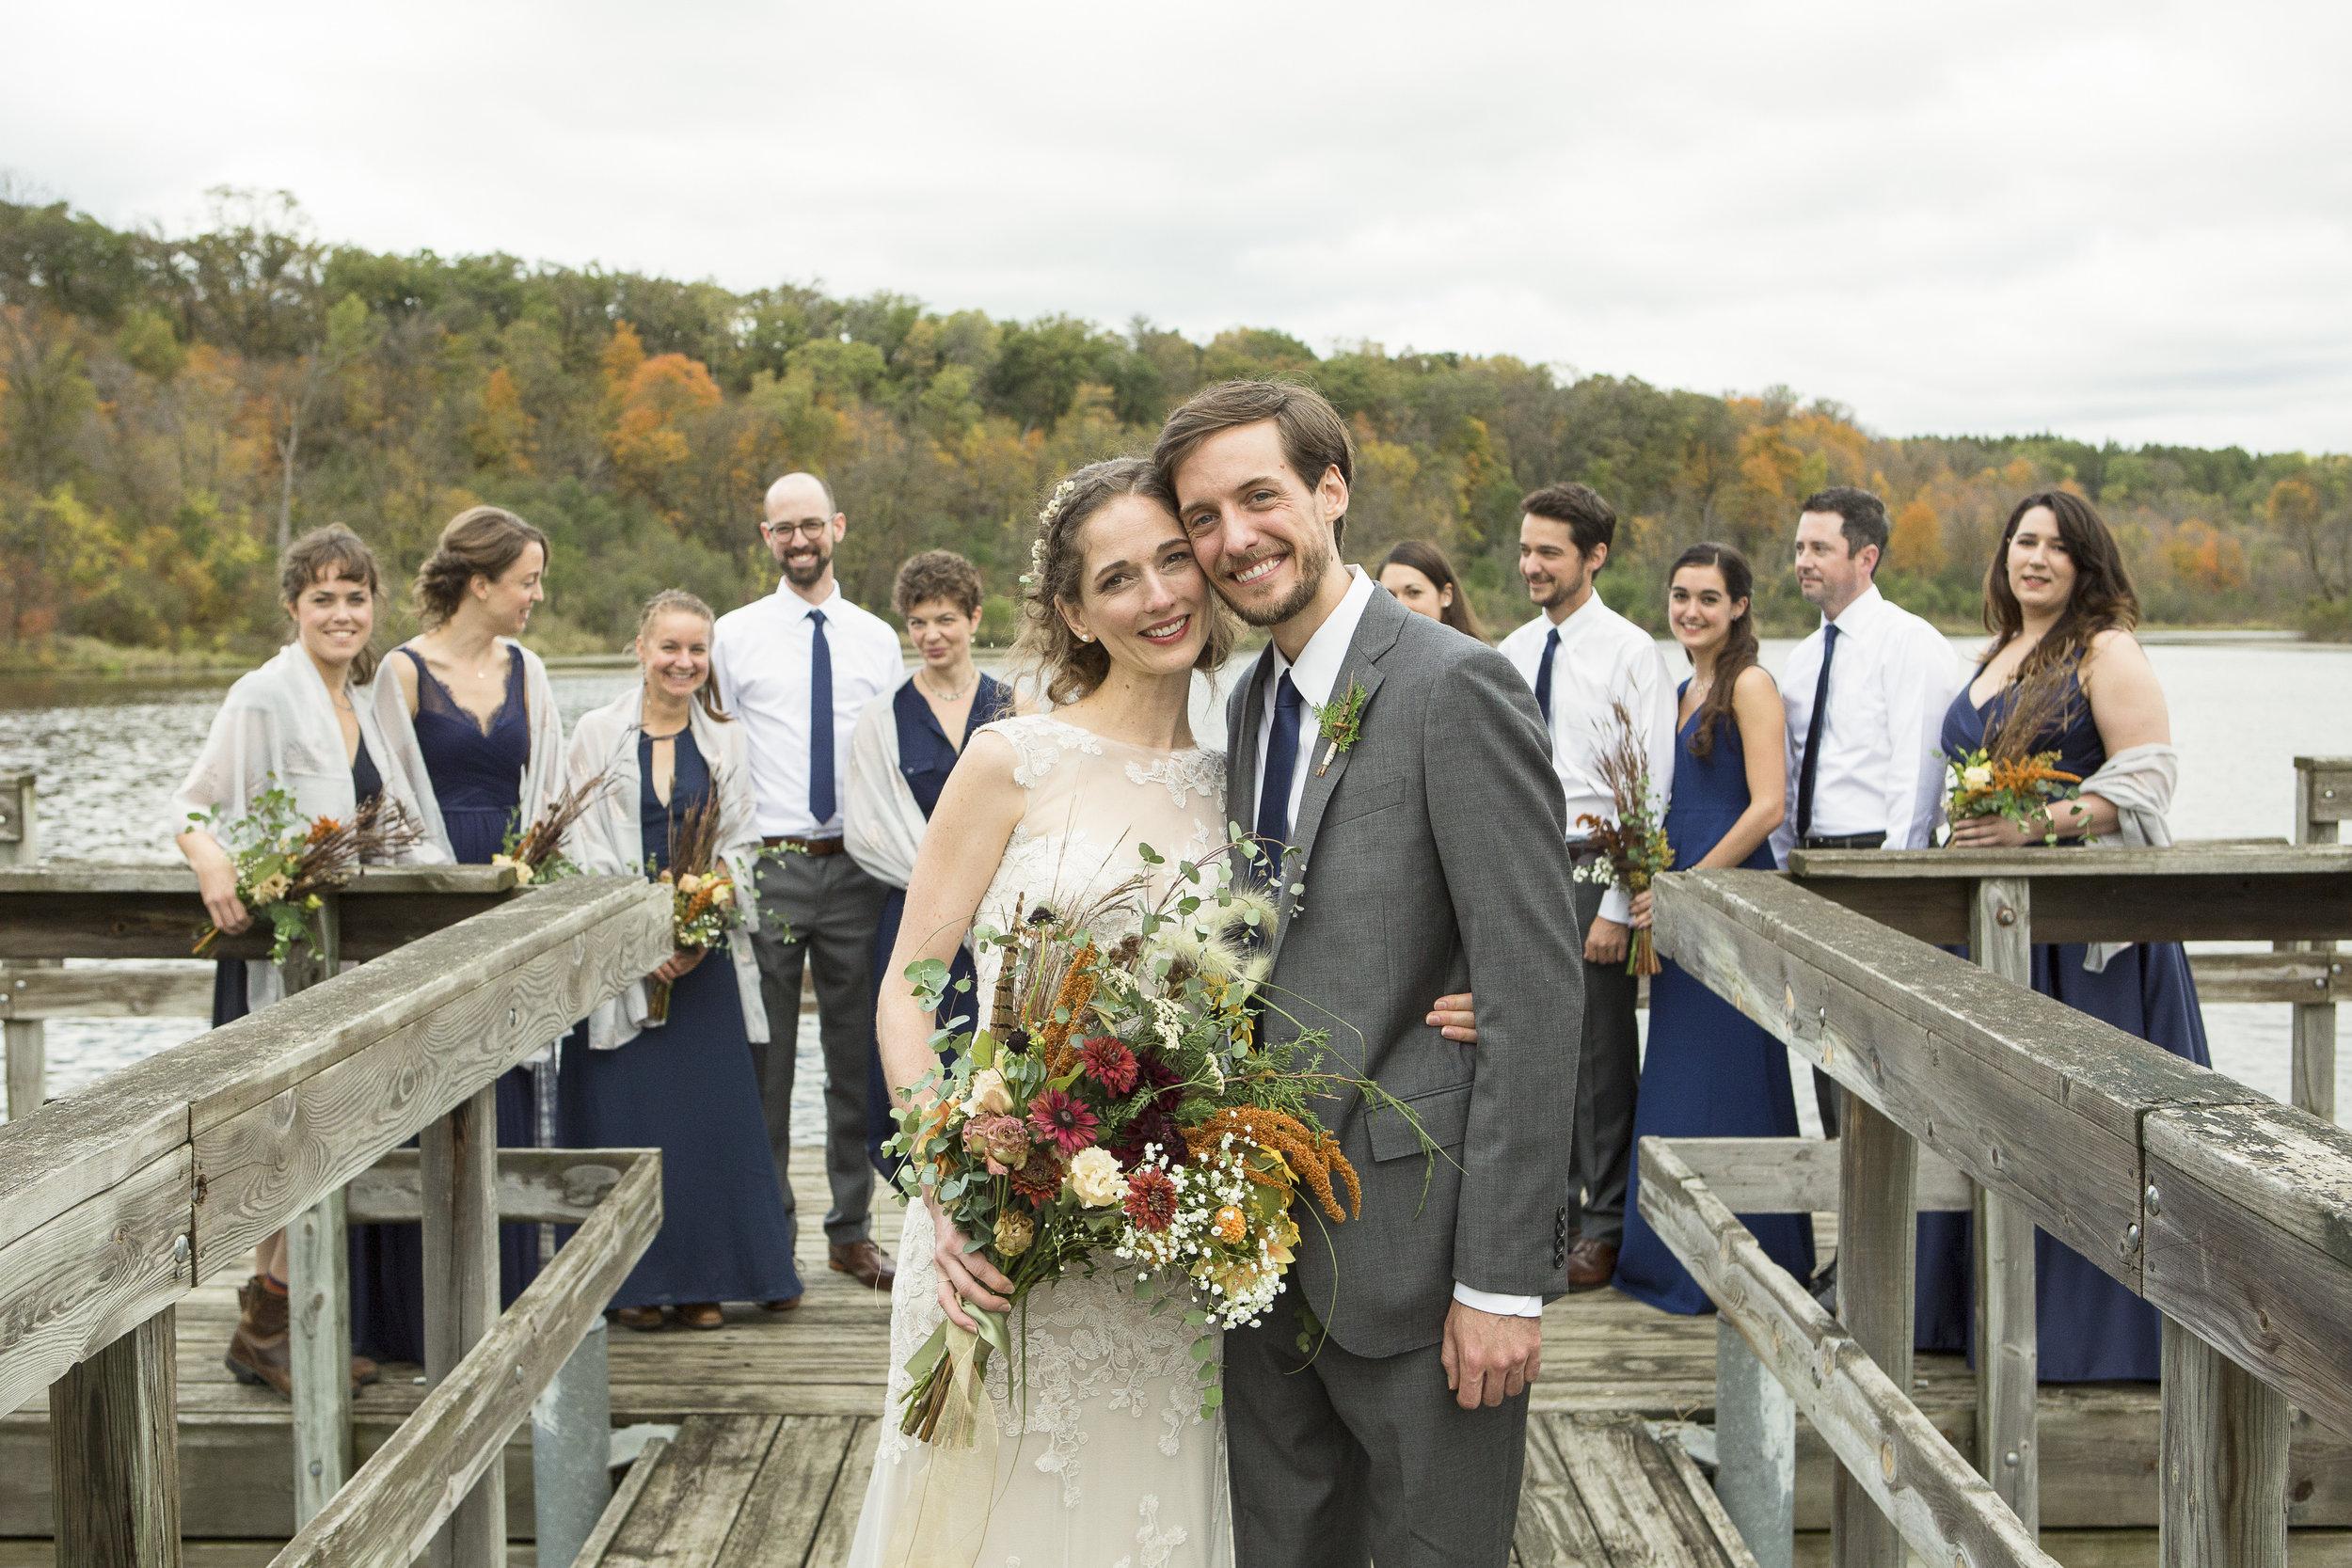 Stillwater_MN_Wedding_Photographer_22.jpg